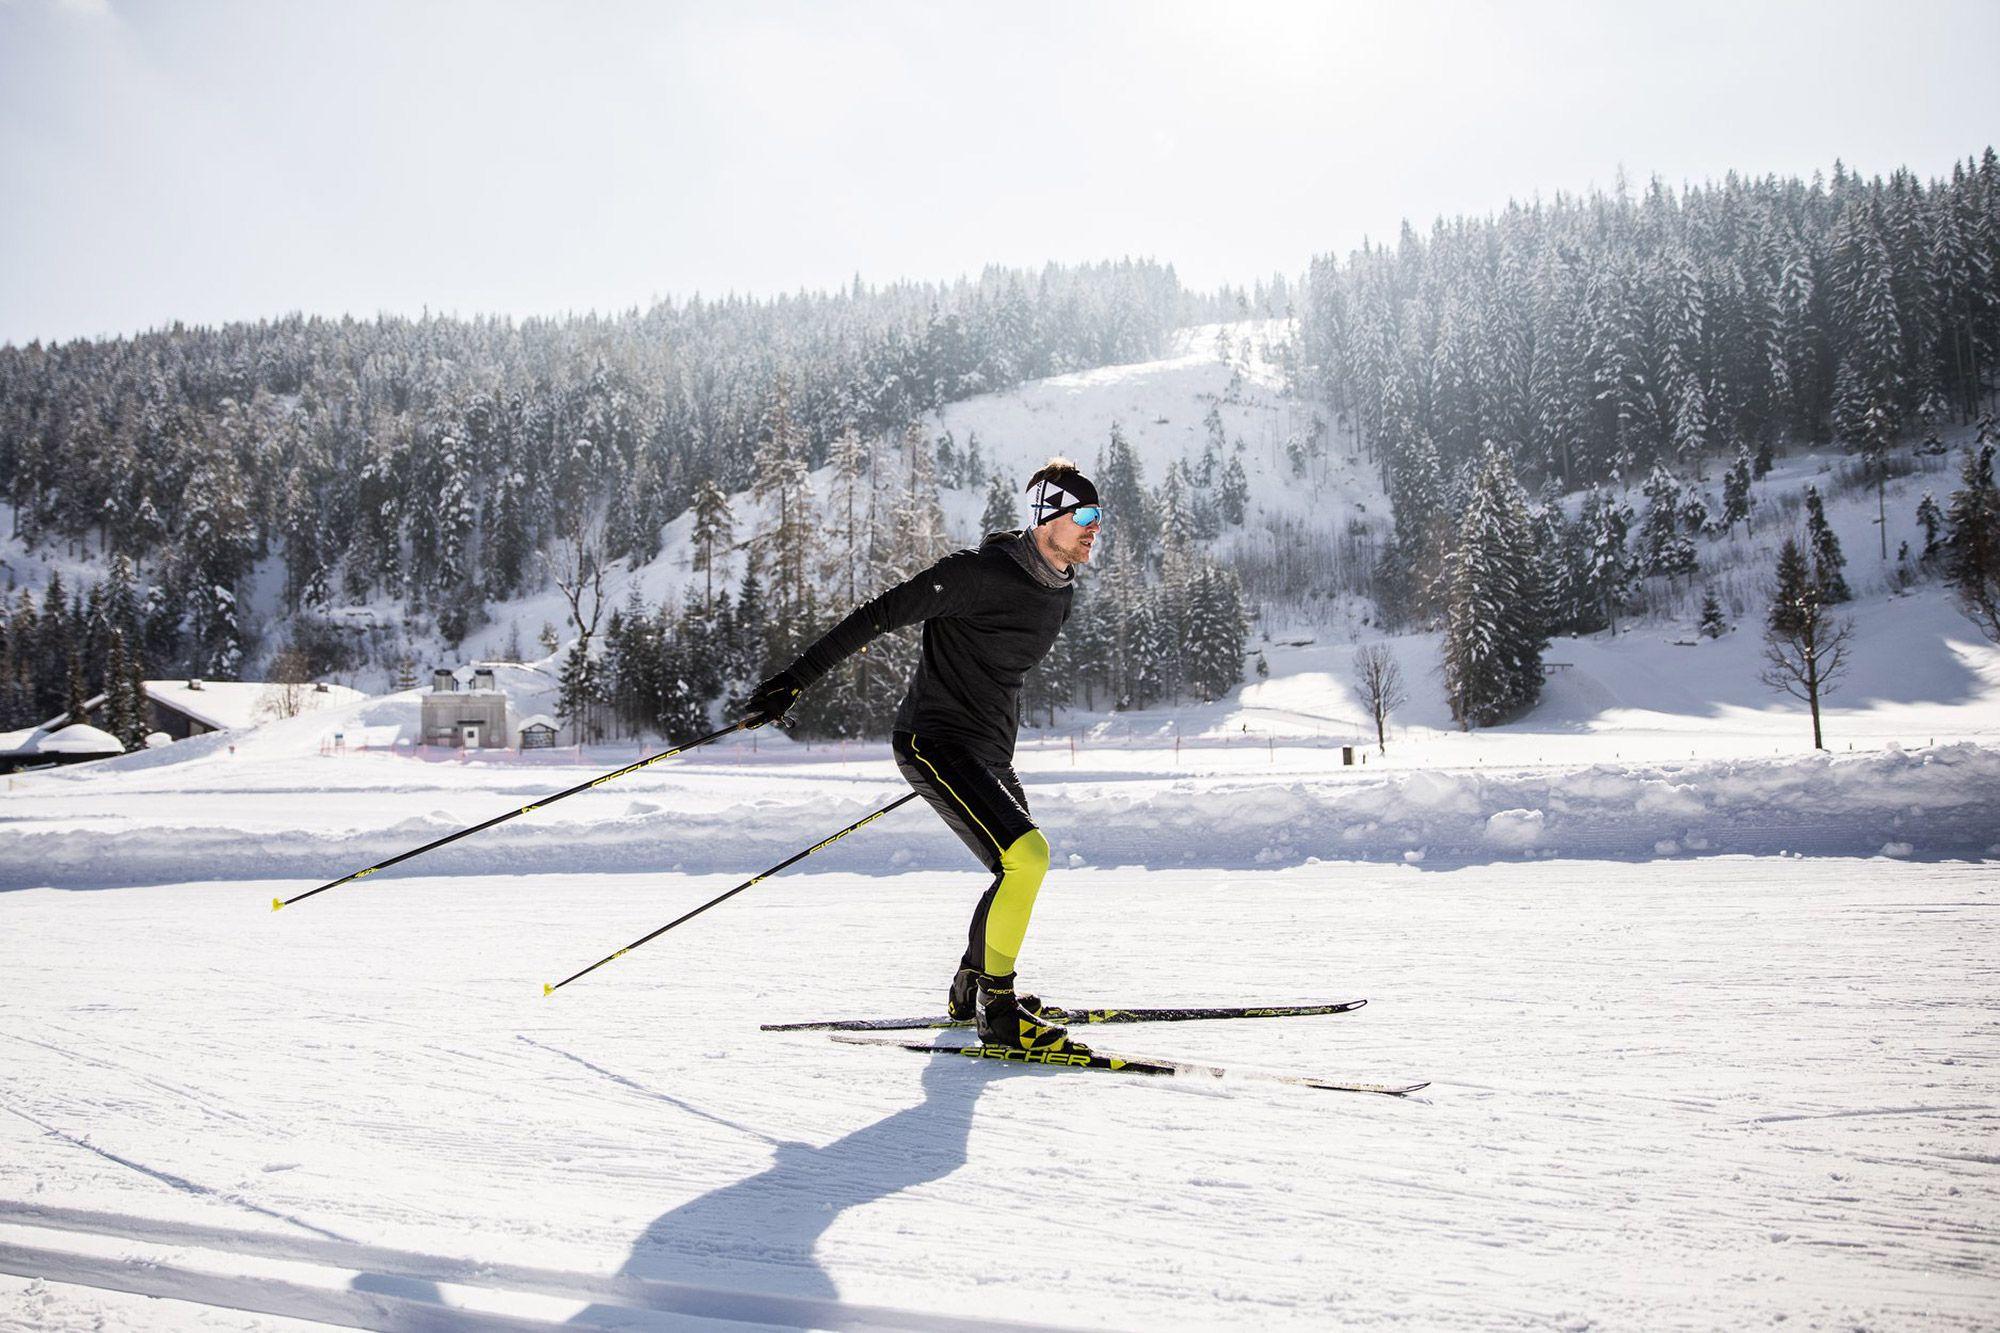 How To Choose Cross Country Ski Gear Goeast Cross Country Skiing Cross Country Ski Gear